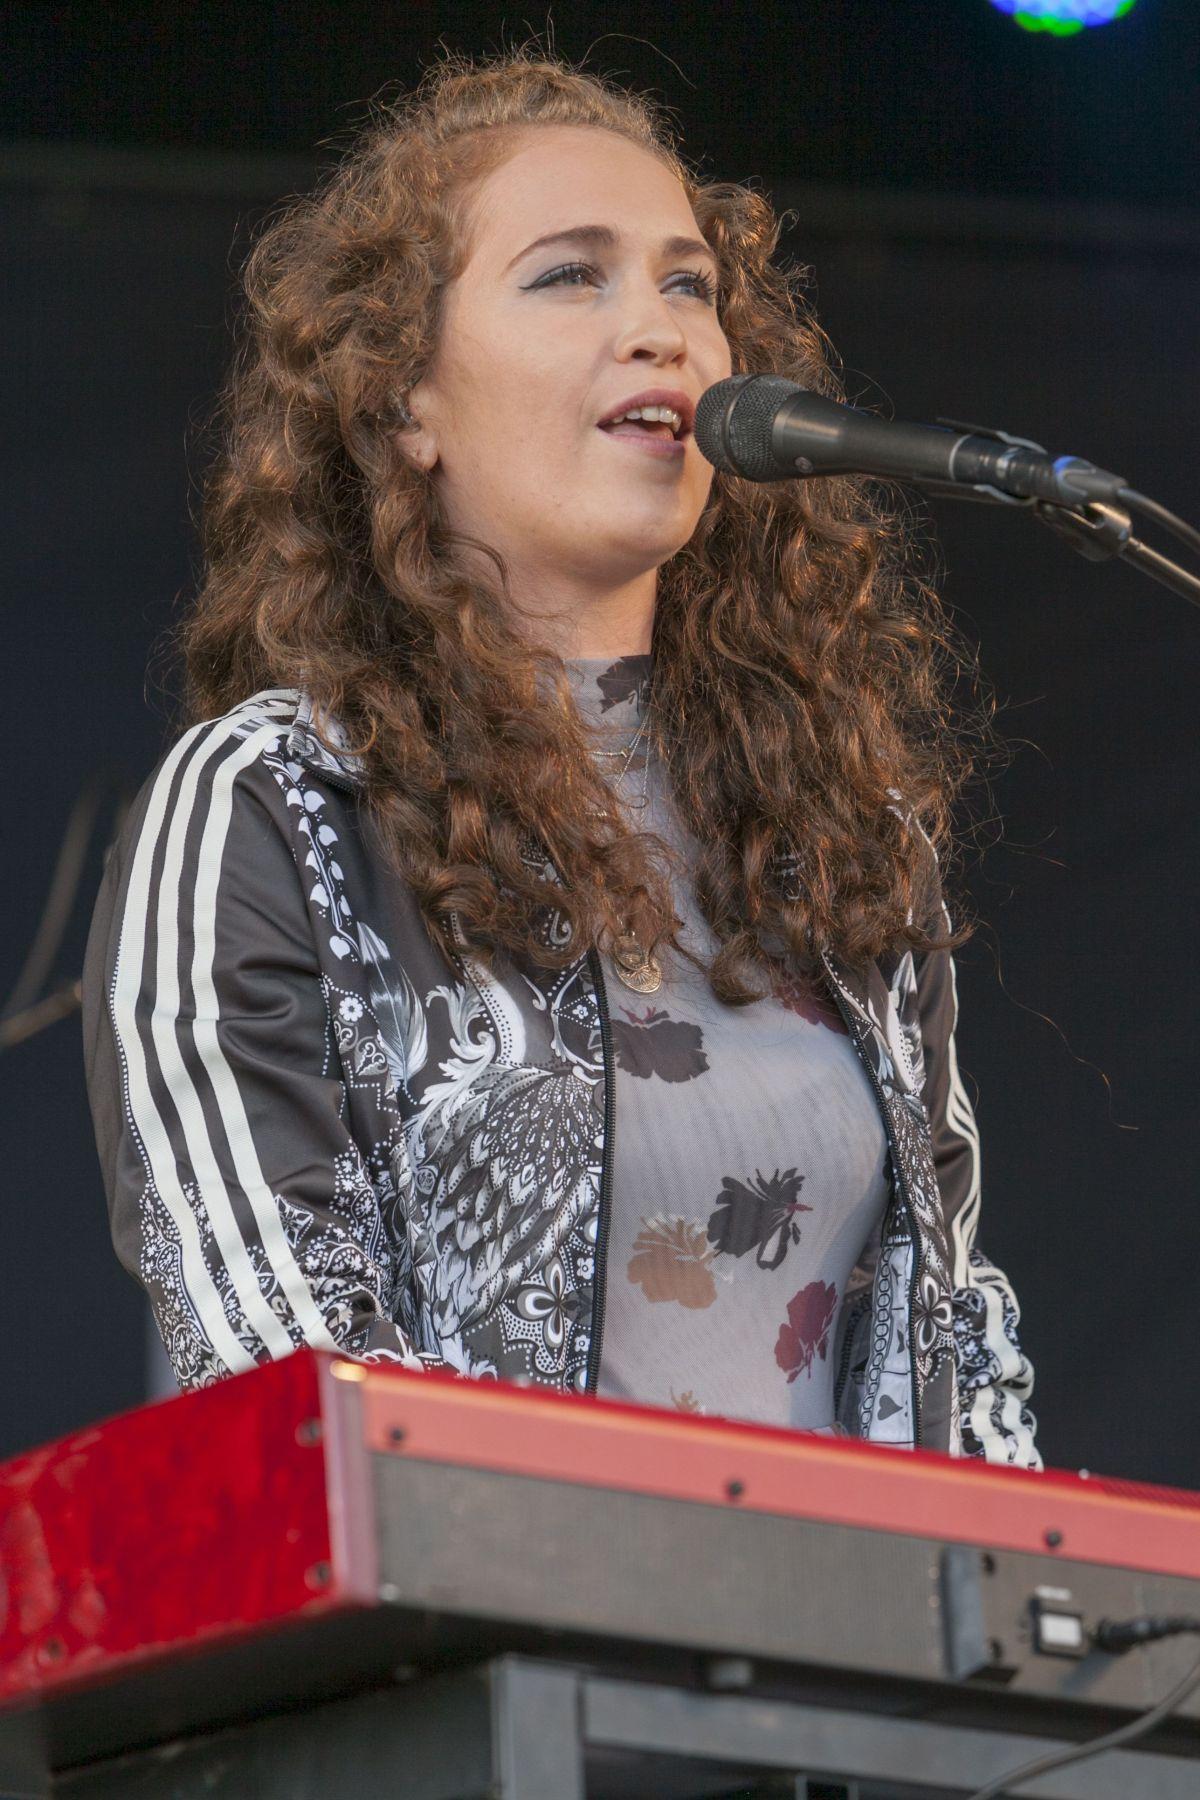 RAE MORRIS Performs at British Summertime Festival at Hyde Park in London 07/02/2016